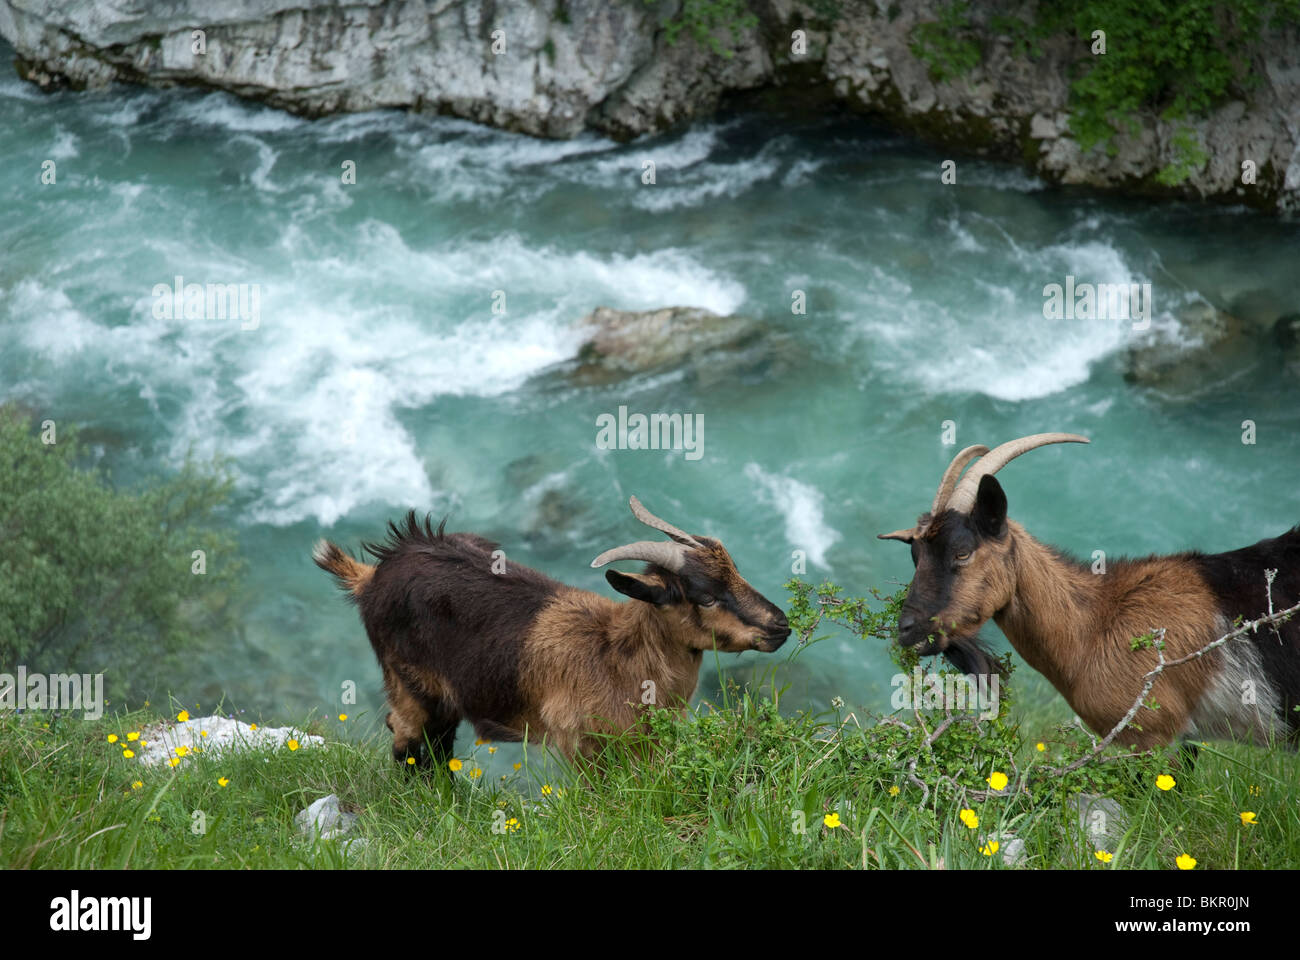 Wild goats, Cares Gorge, Central Massif, Picos de Europa, Spain - Stock Image